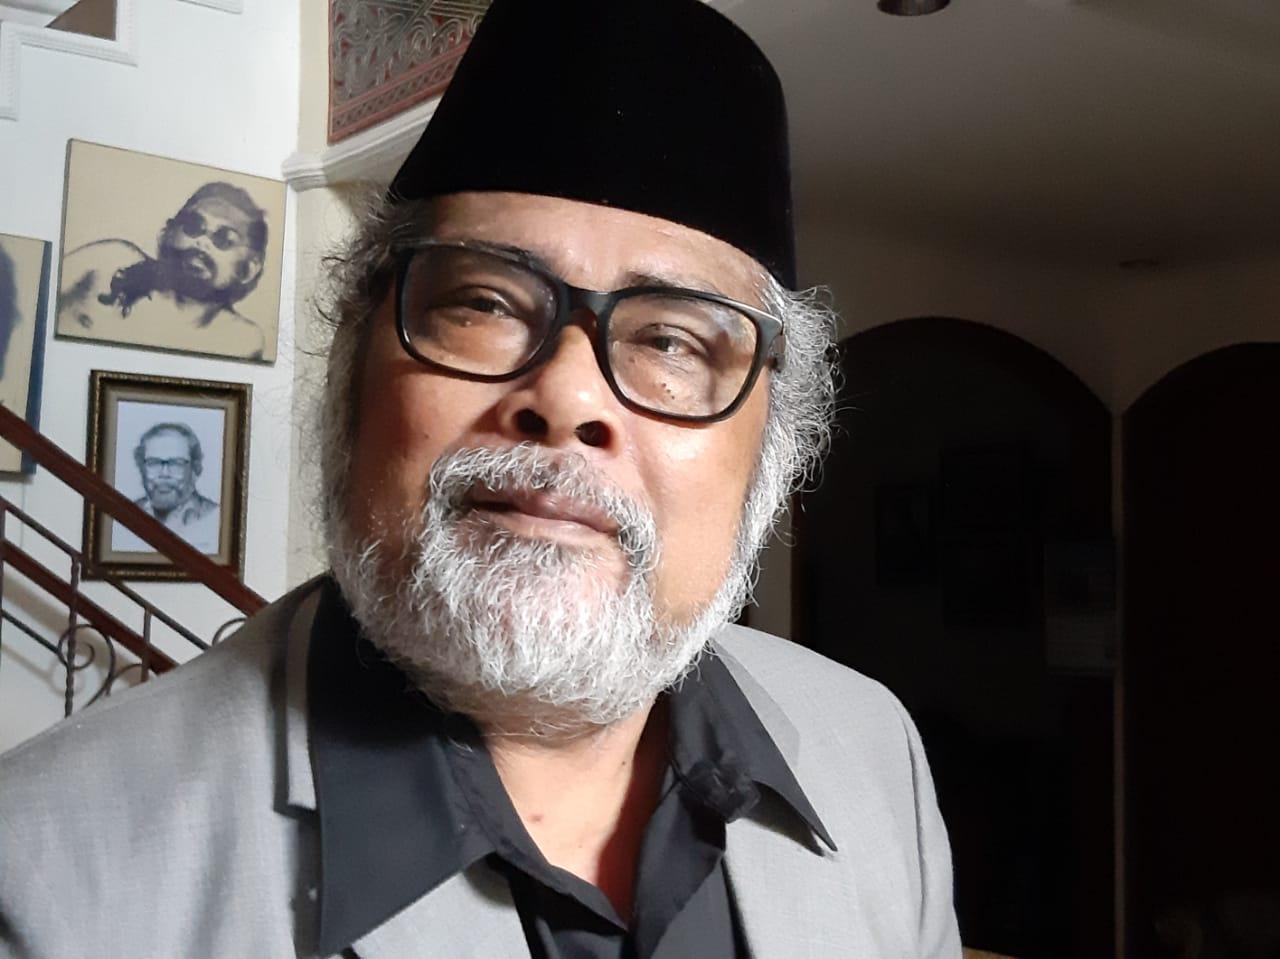 Arist Merdeka Sirait Desak Segera Tangkap dan Tahan Pelaku Pencabulan Balita di Bogor Selatan